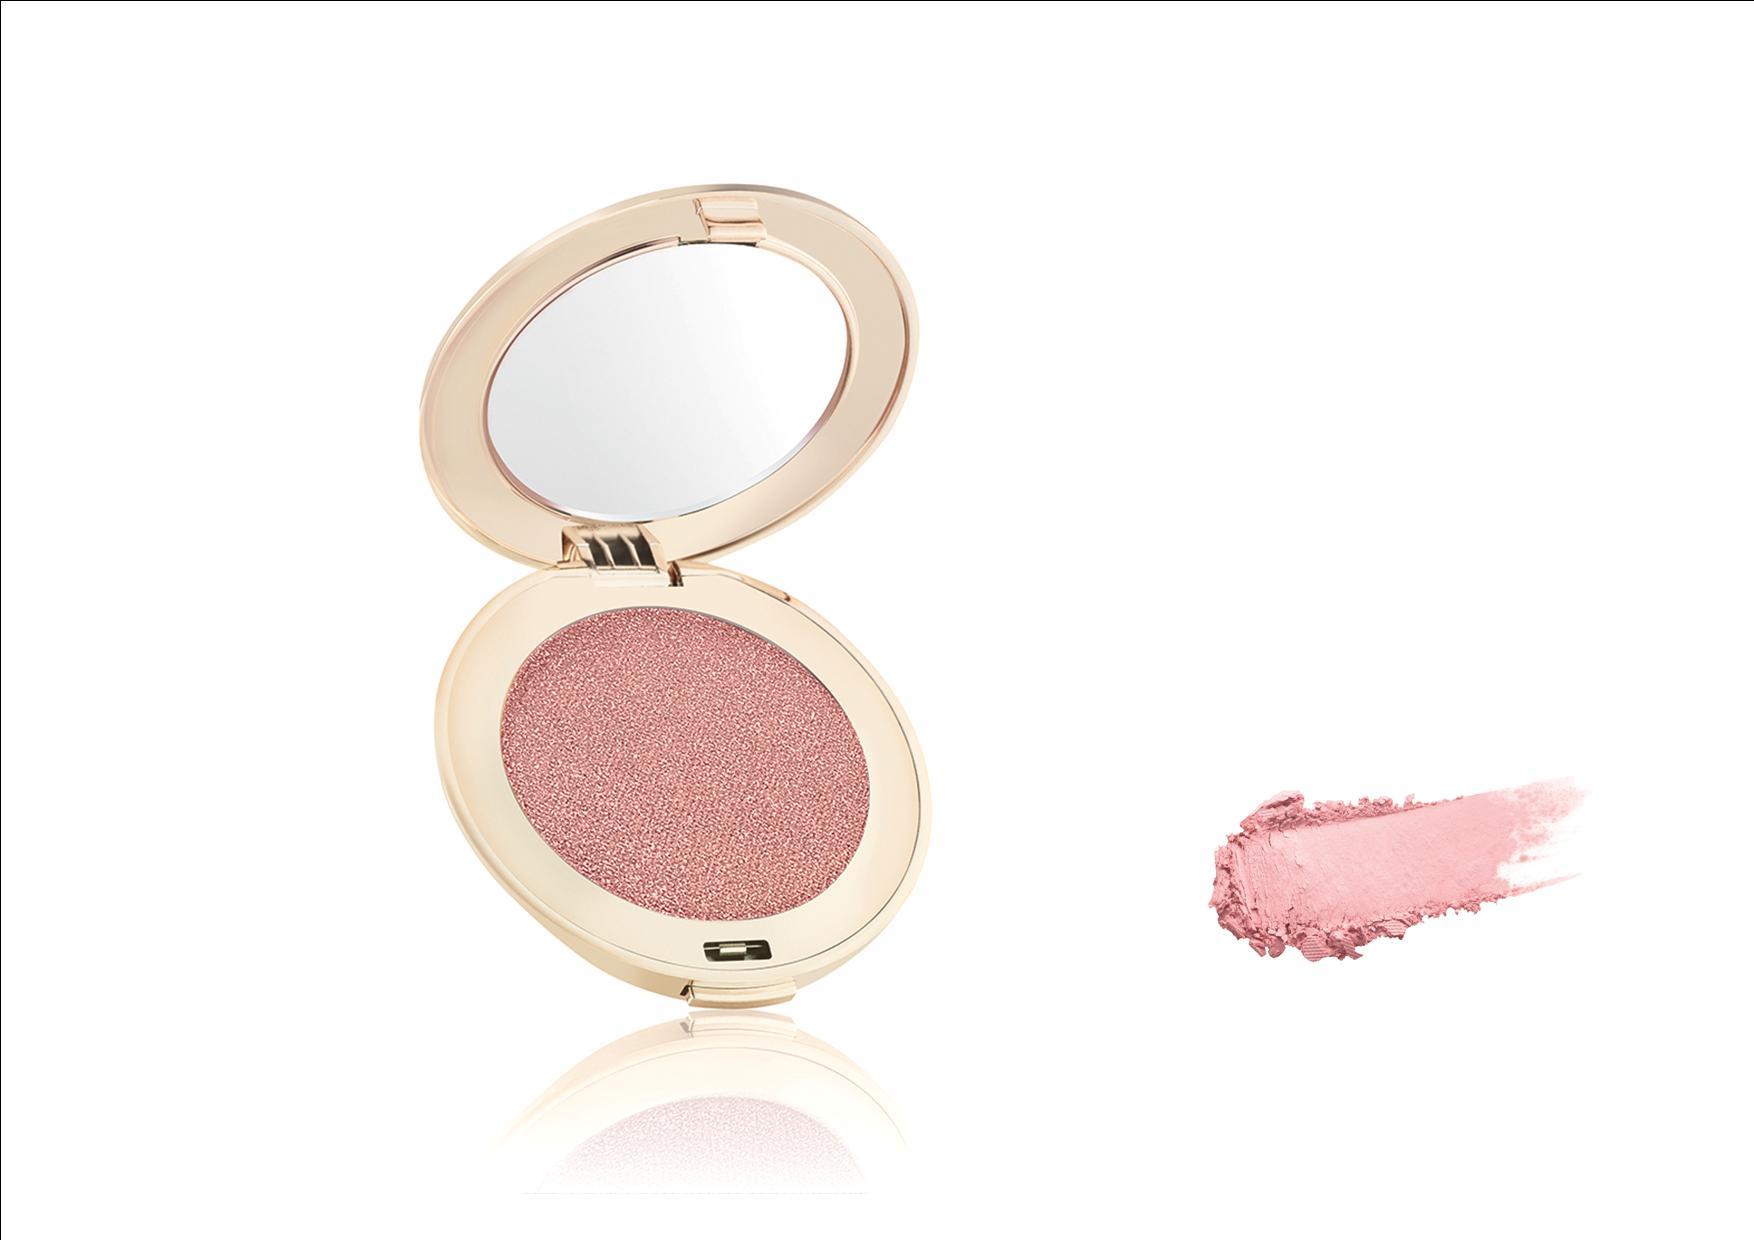 Jane Iredale WANGEN Pure Pressed Blush Cotton Candy